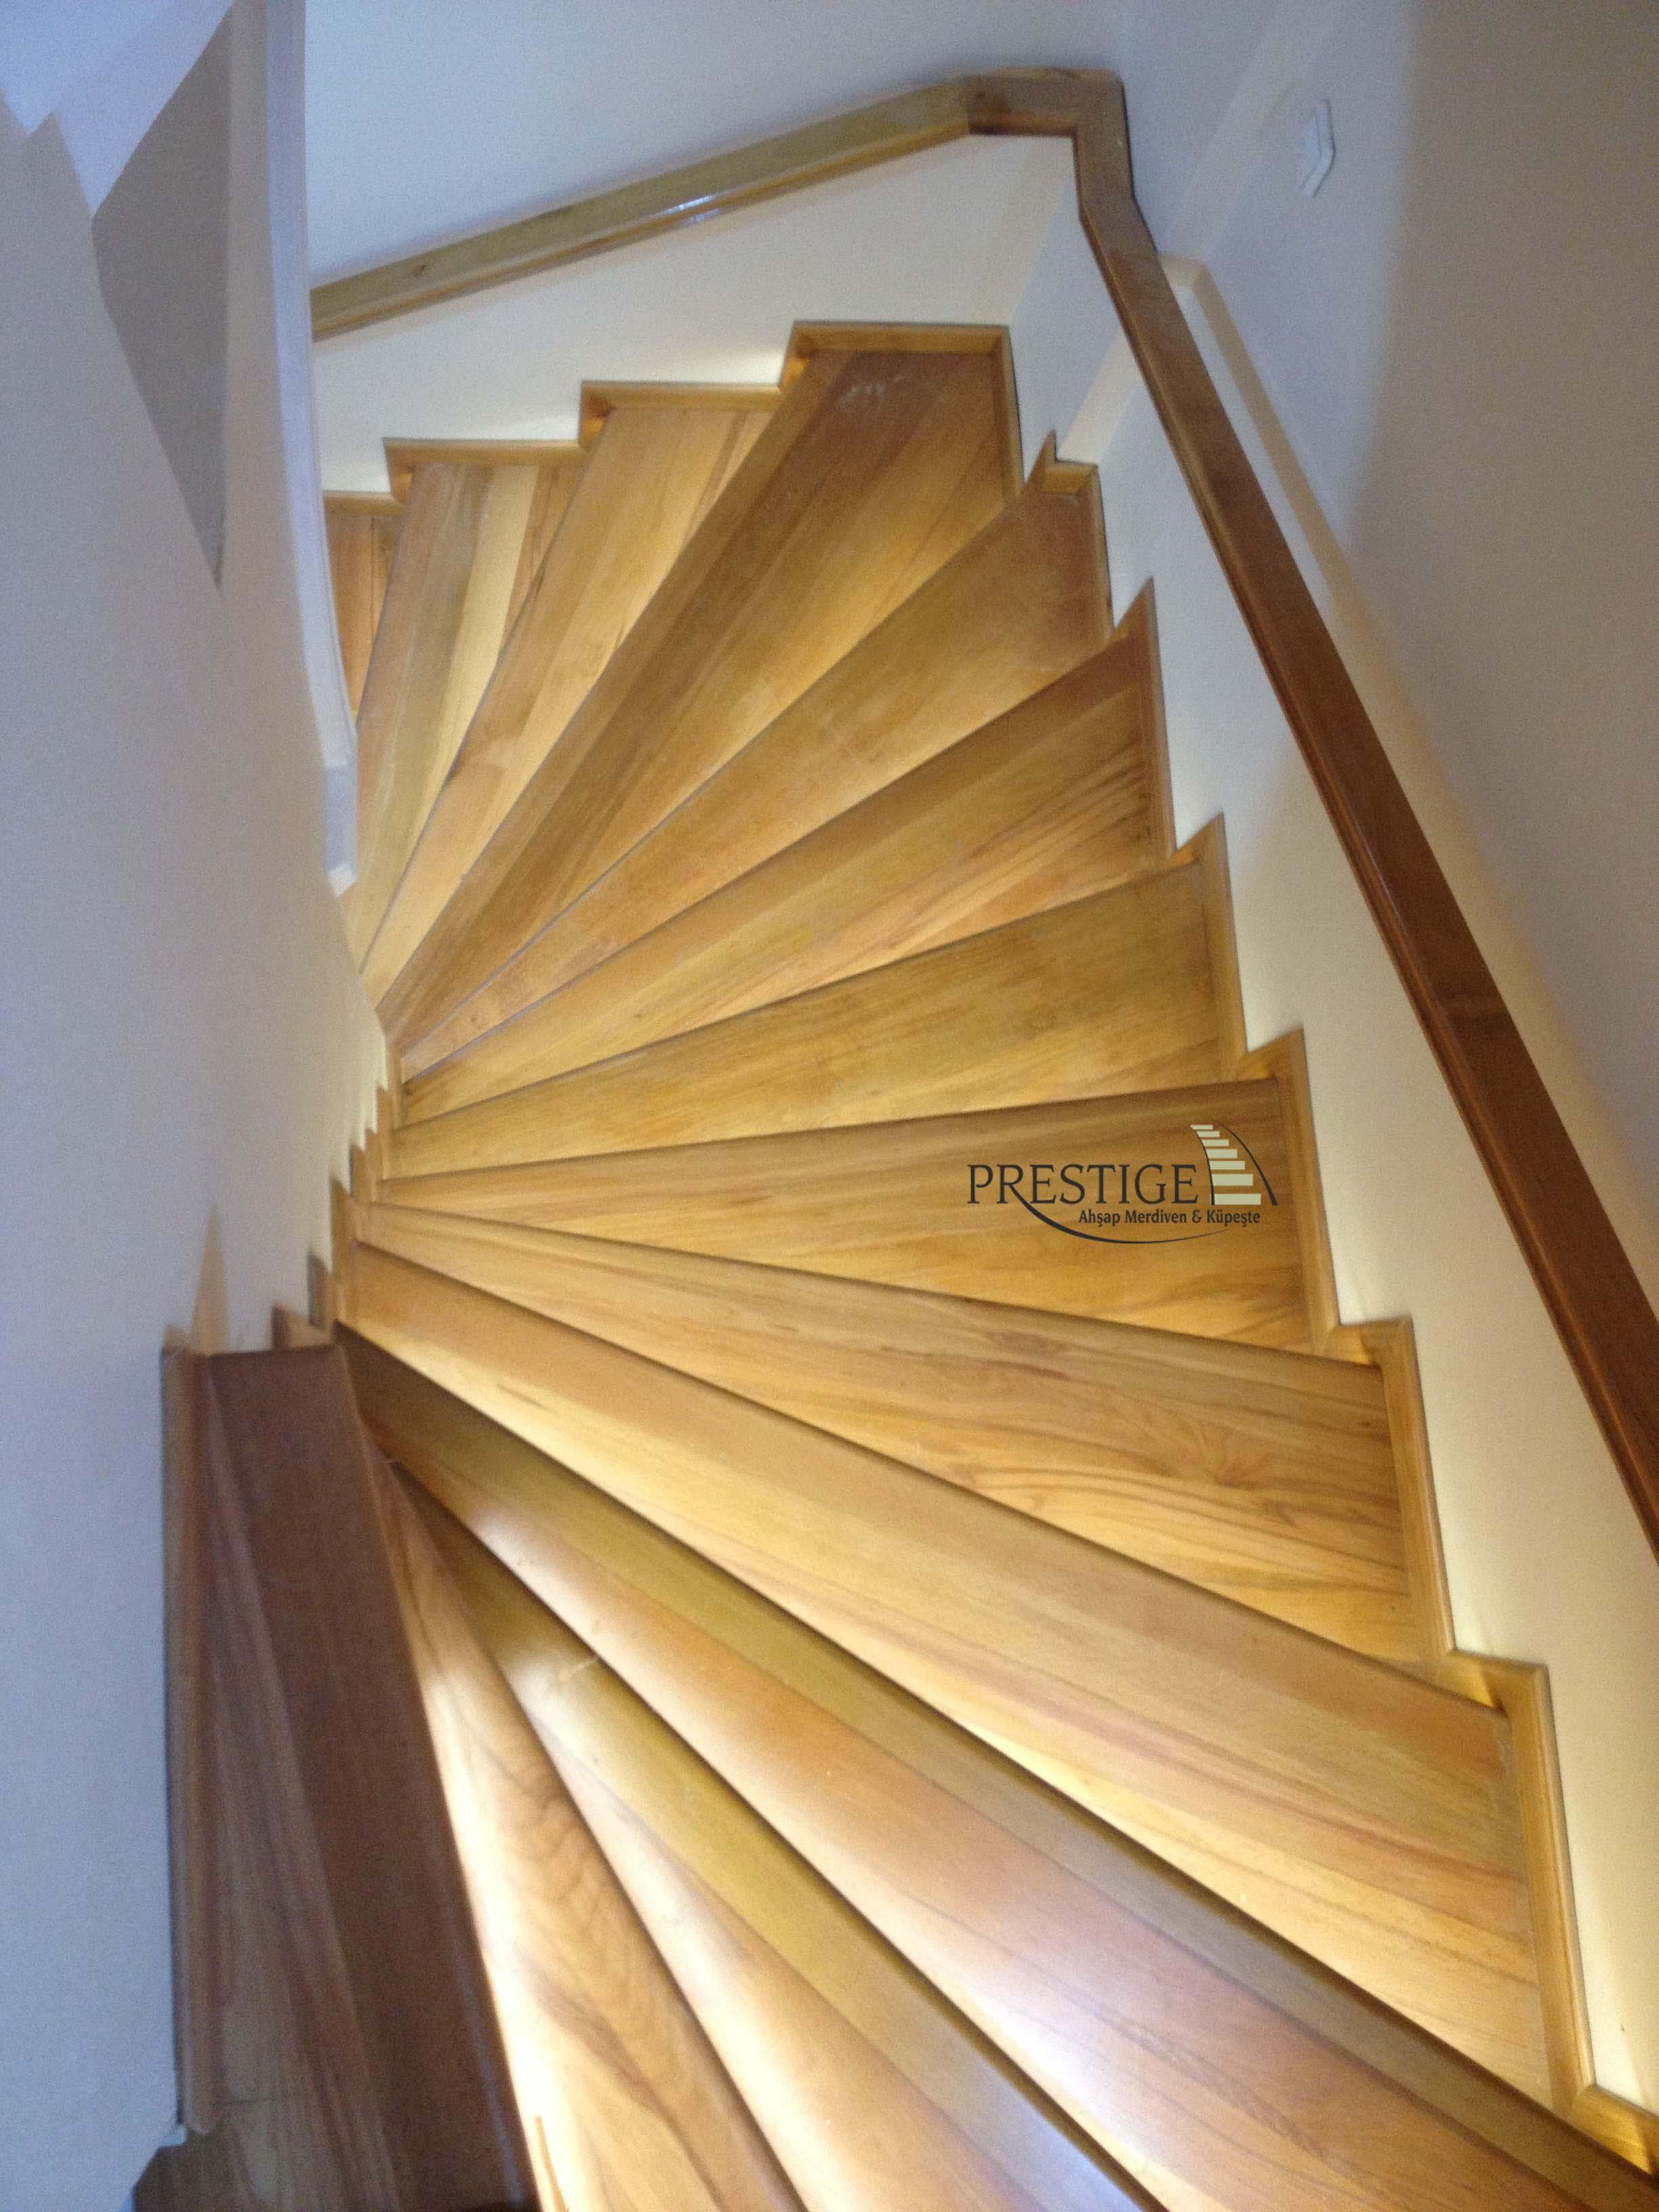 duvar küpeşteli ledli merdiven